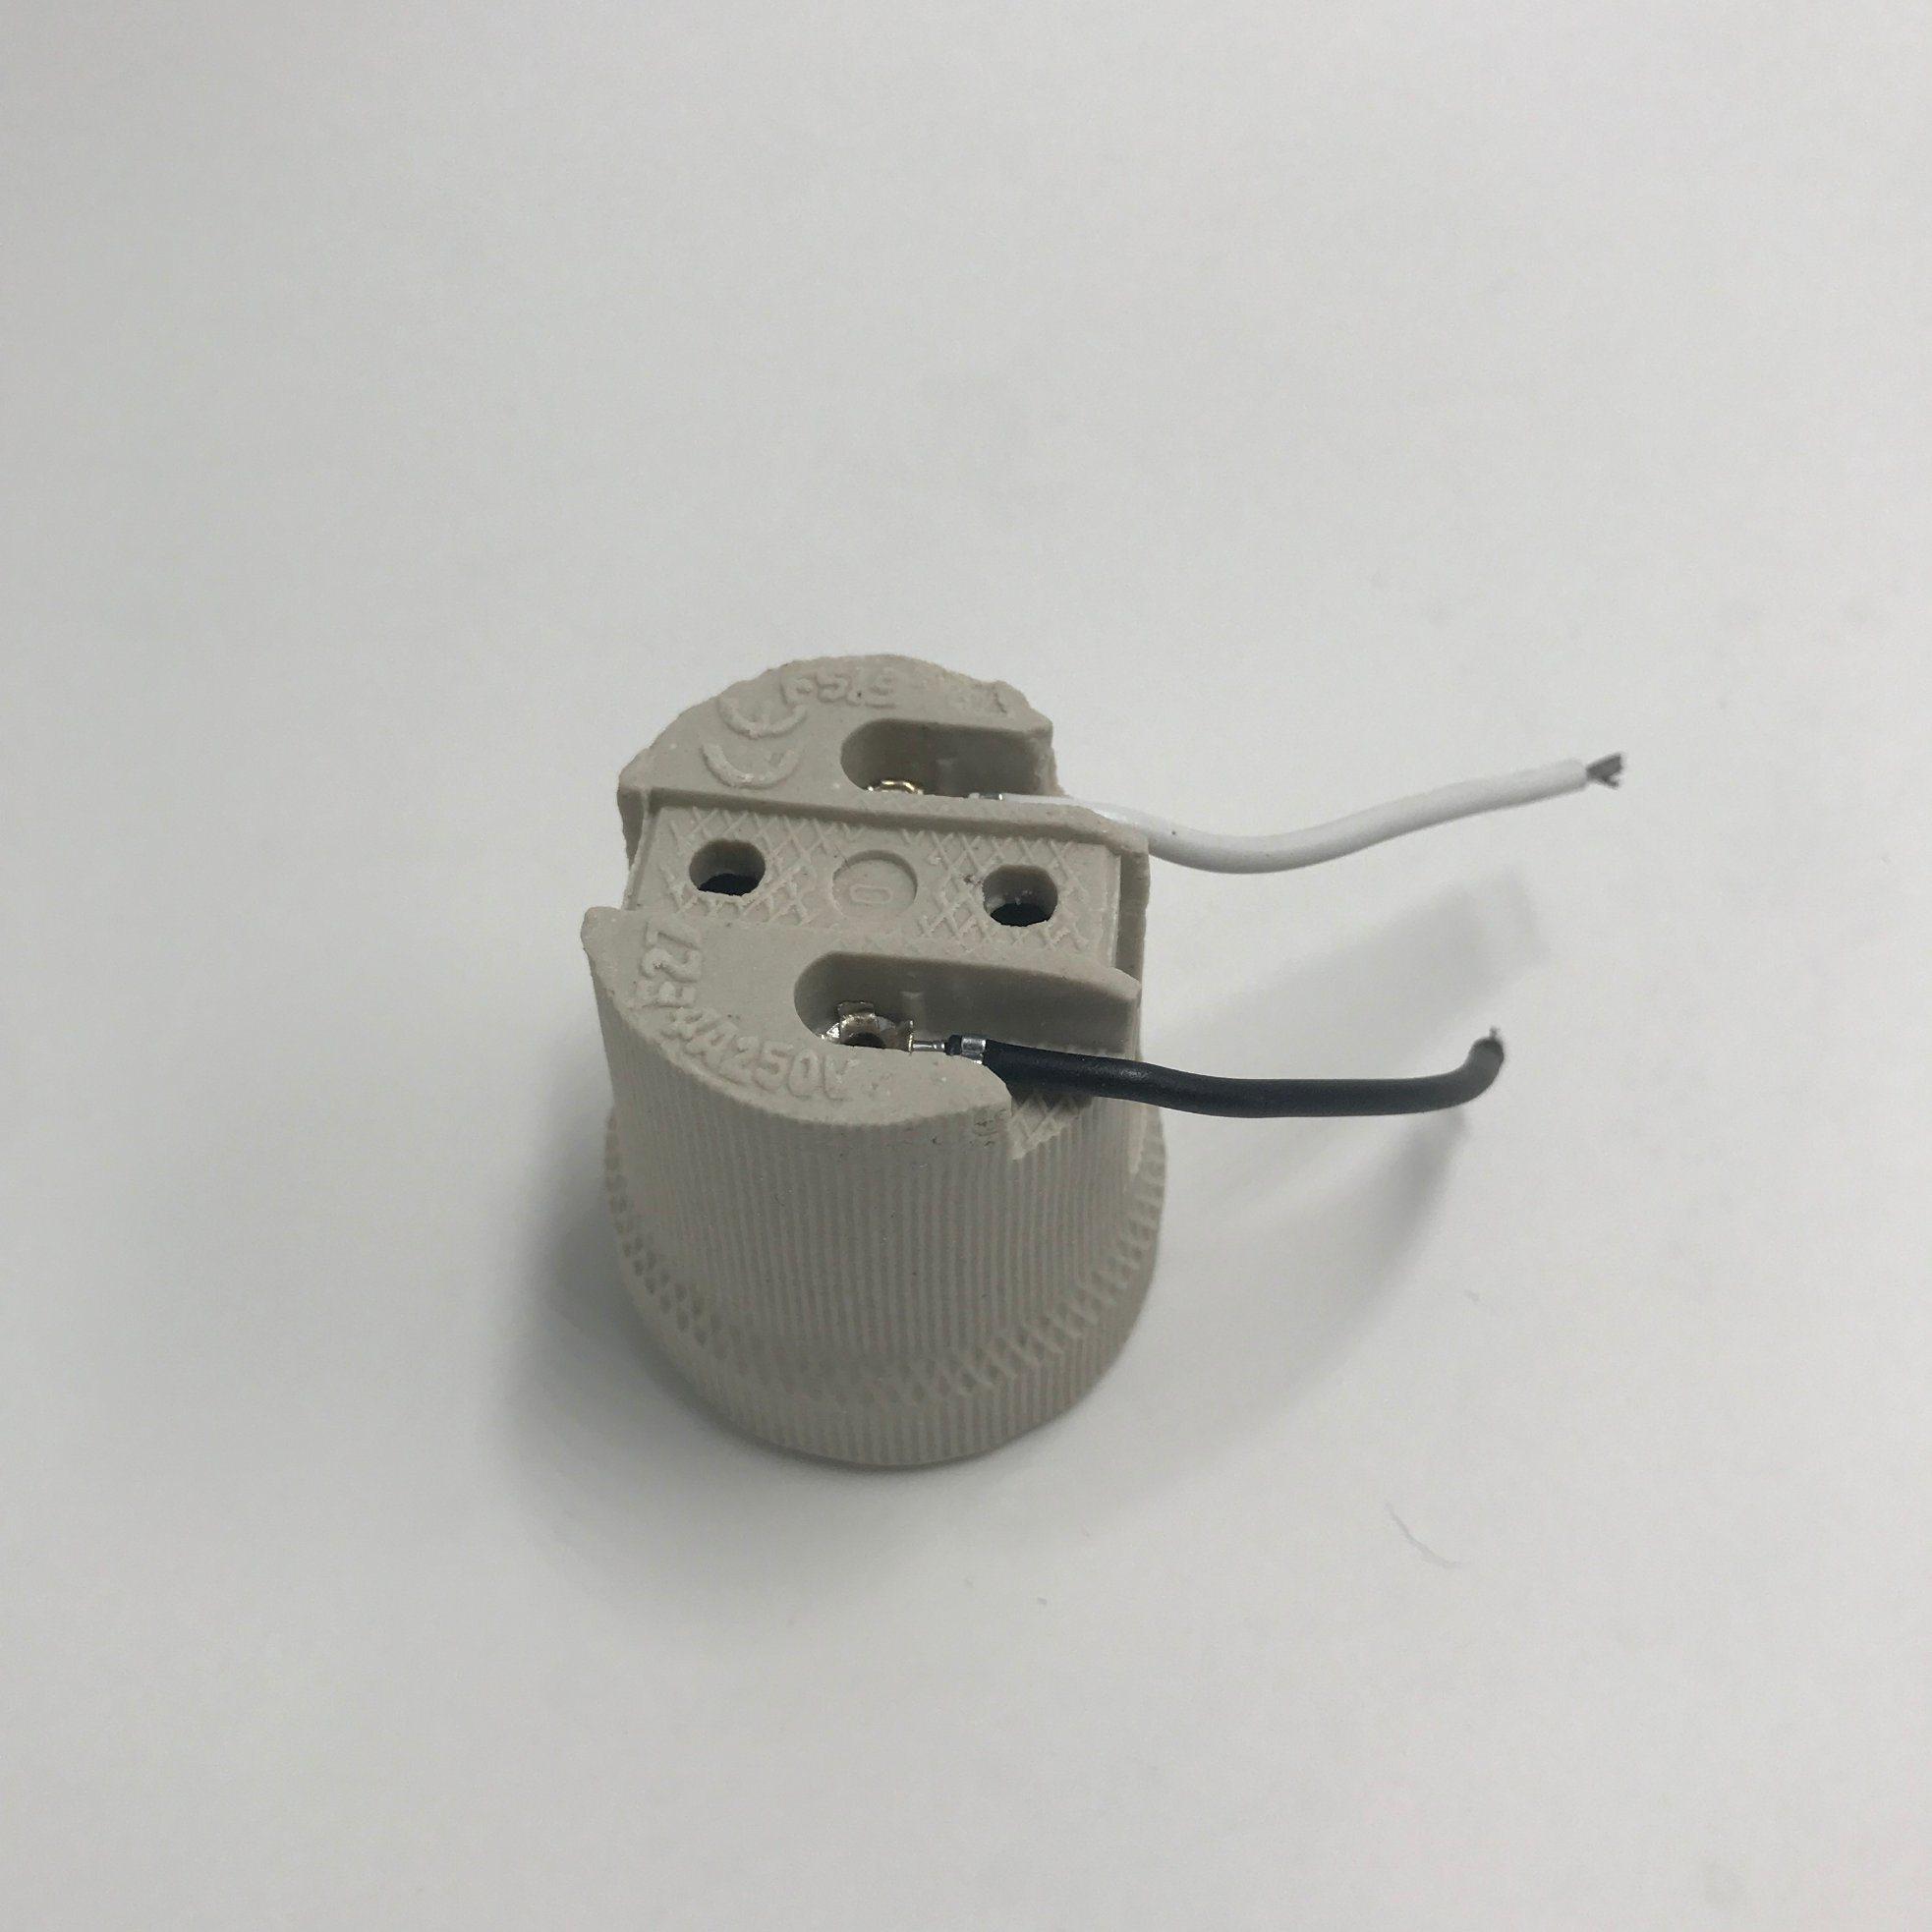 Wiring A Lamp Socket